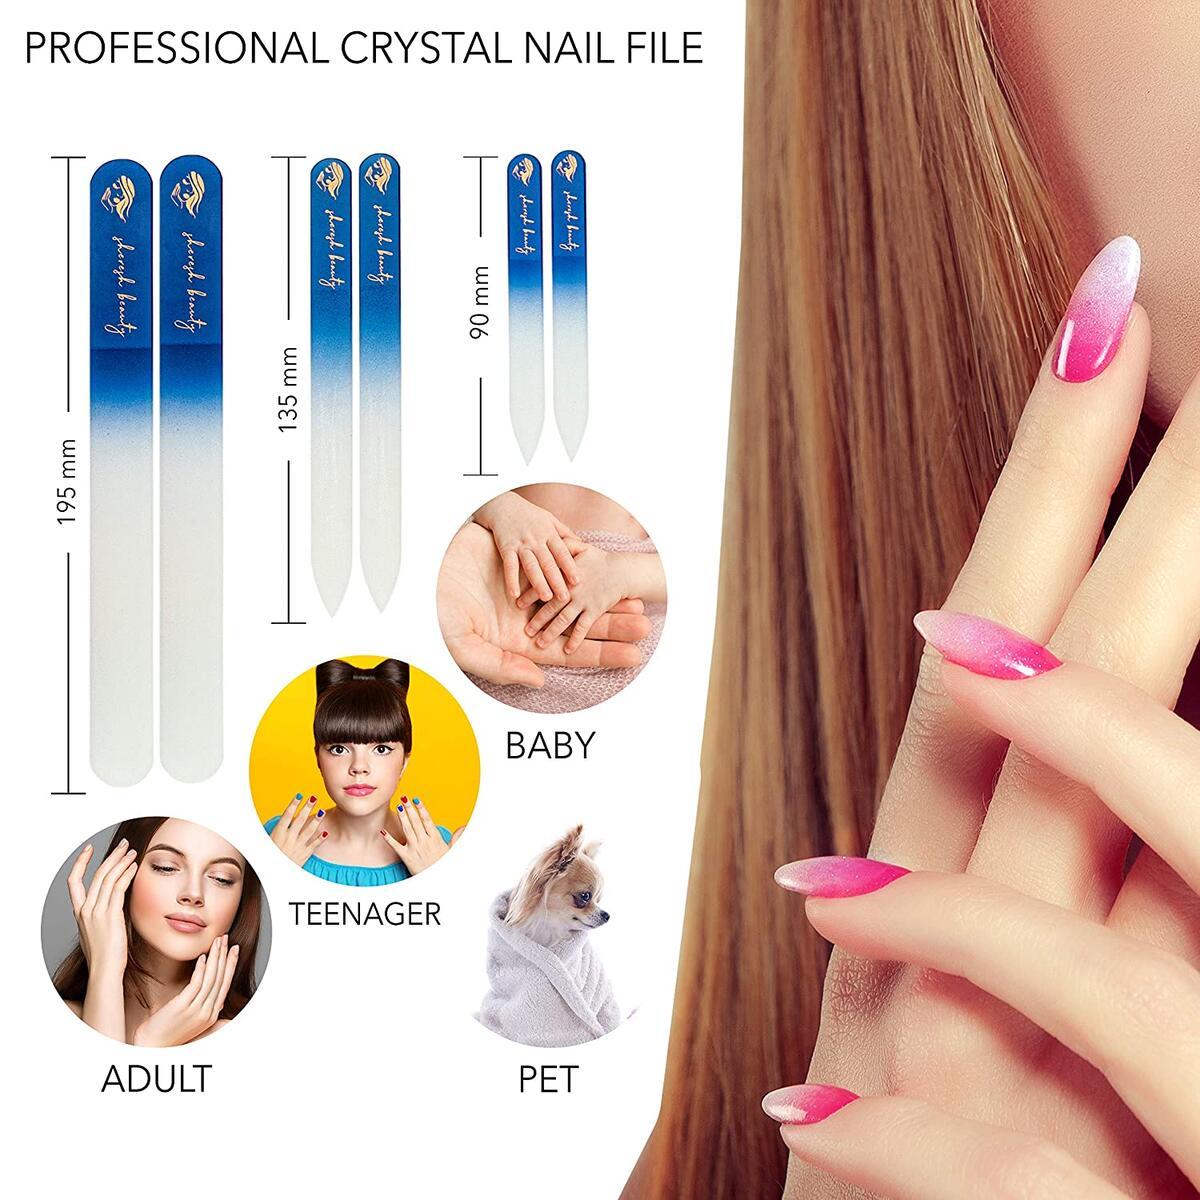 Sheresh Beauty Professional GLASS NAIL FILE AND BUFFERS Set Tools of 14 PCS, 6 Rectangular Nail Buffer Polisher Sanding Block, 6 Premium Crystal Nail File for Acrylic nails, 2 fingernail Nail Brush